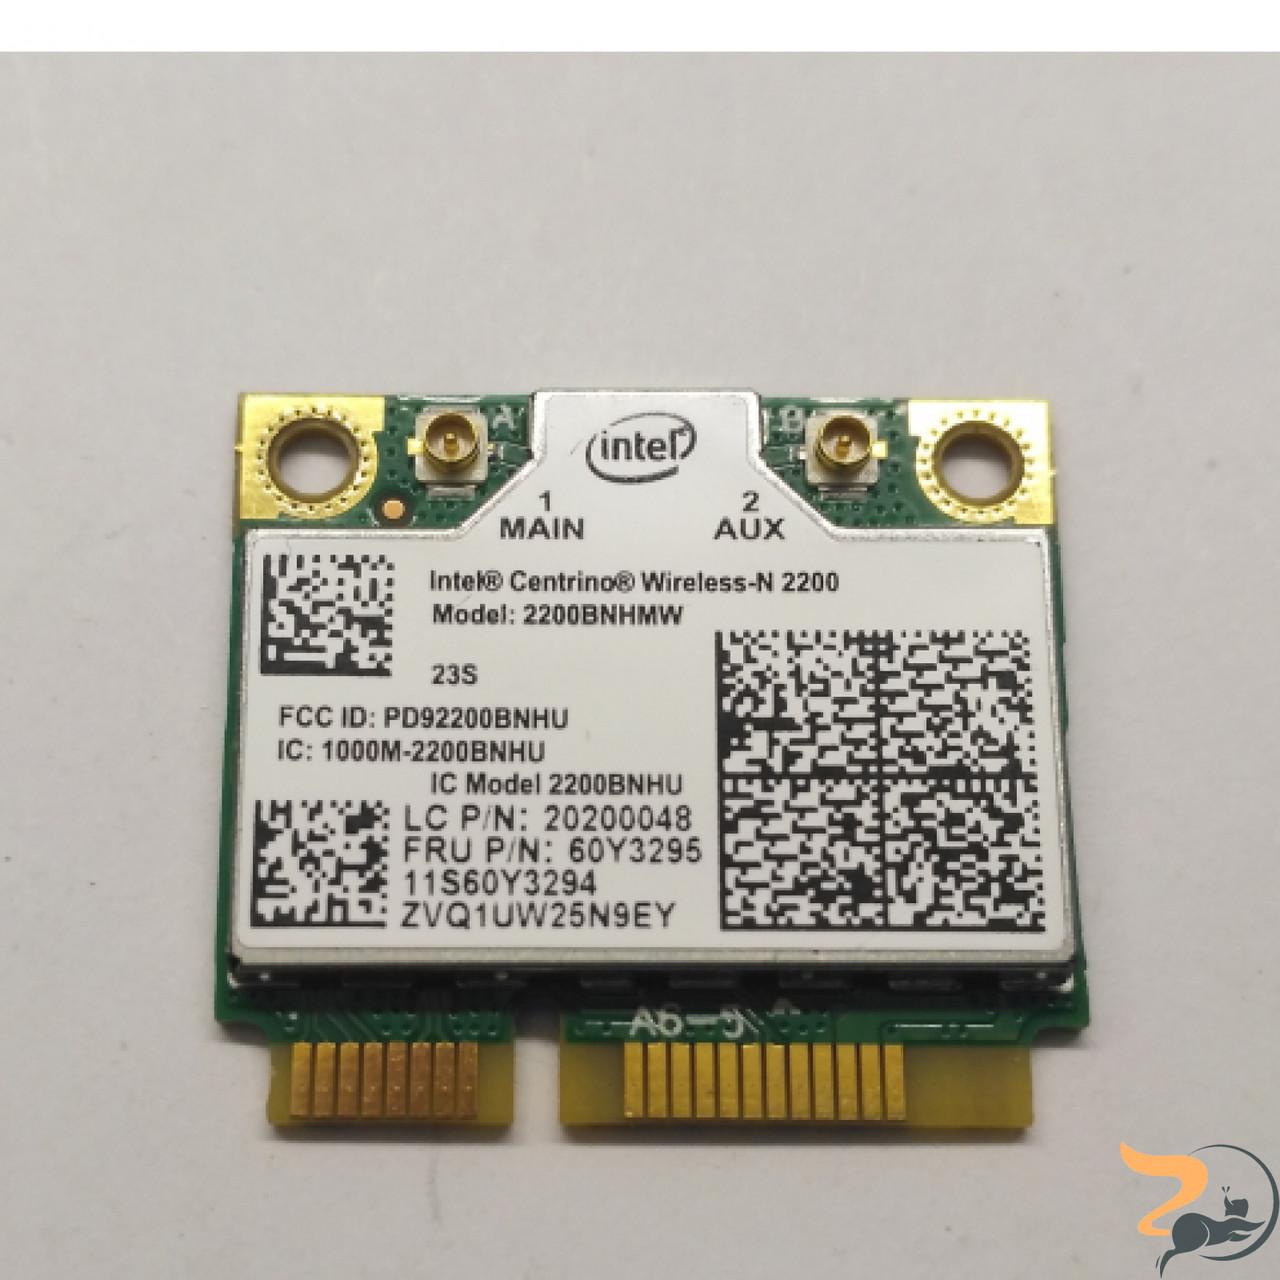 Lenovo ThinkPad S430 Broadcom WLAN Driver for Mac Download